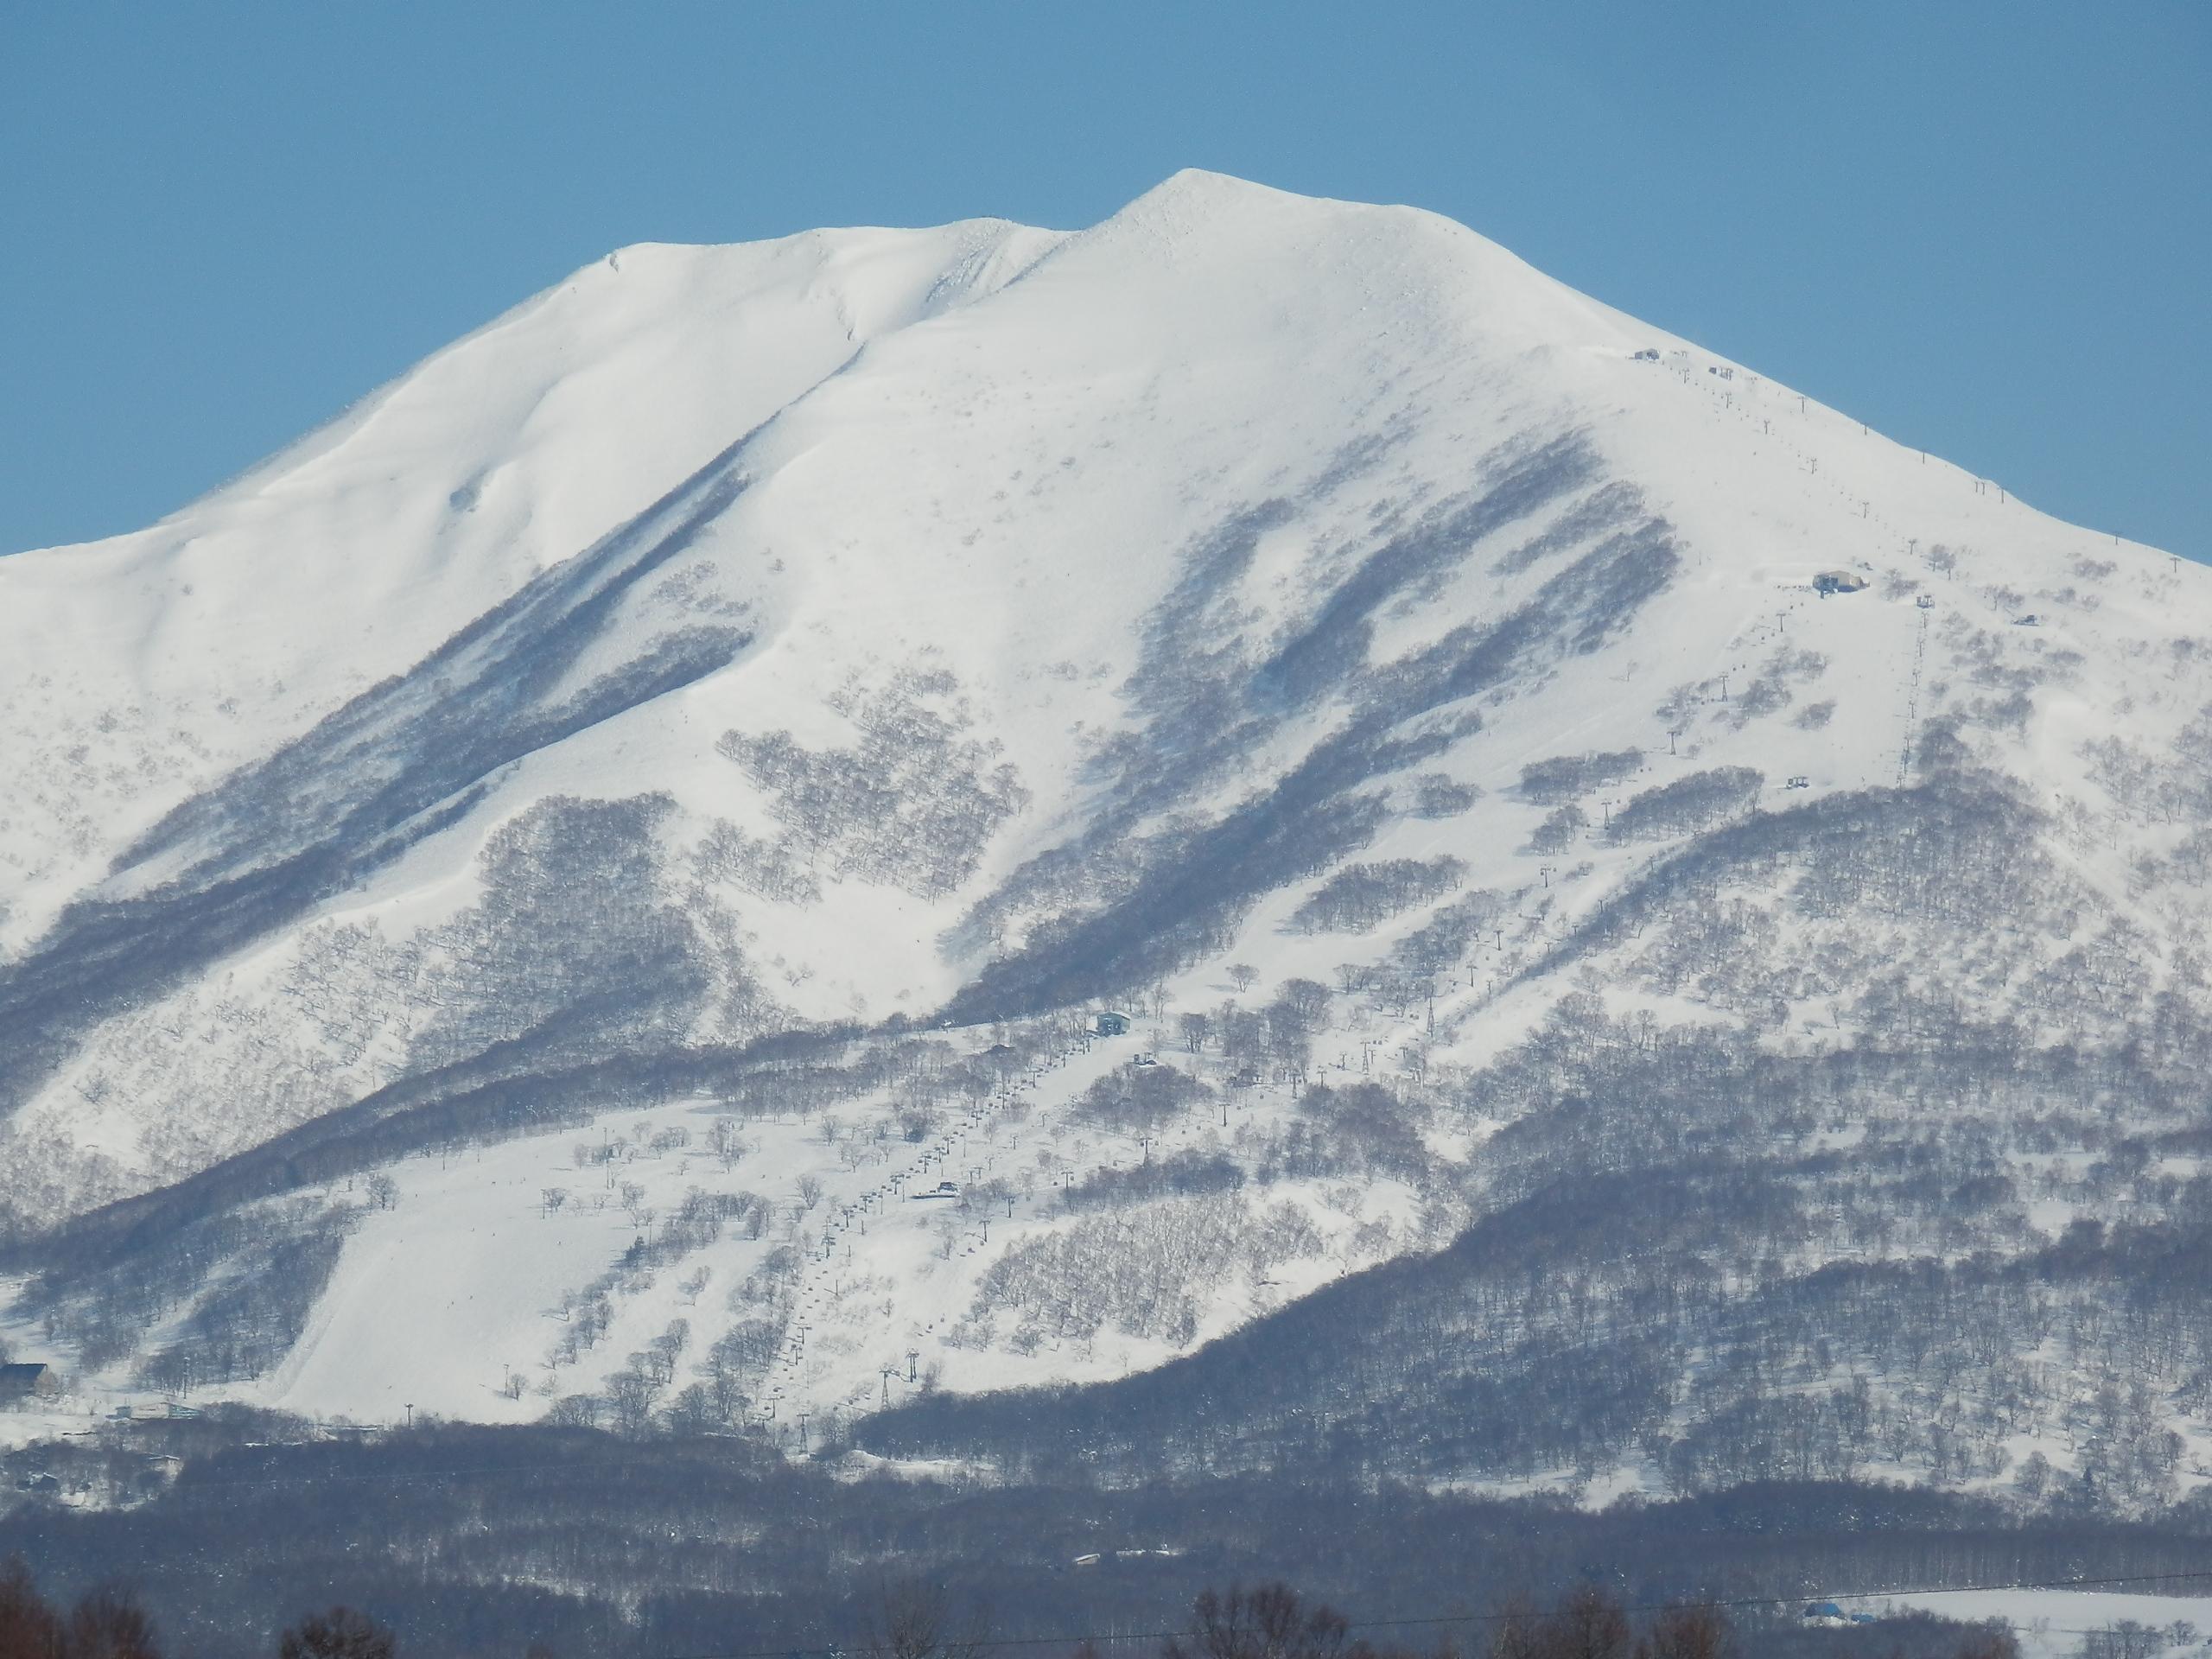 Comprehensive Backcountry Ski Trip in Hokkaido